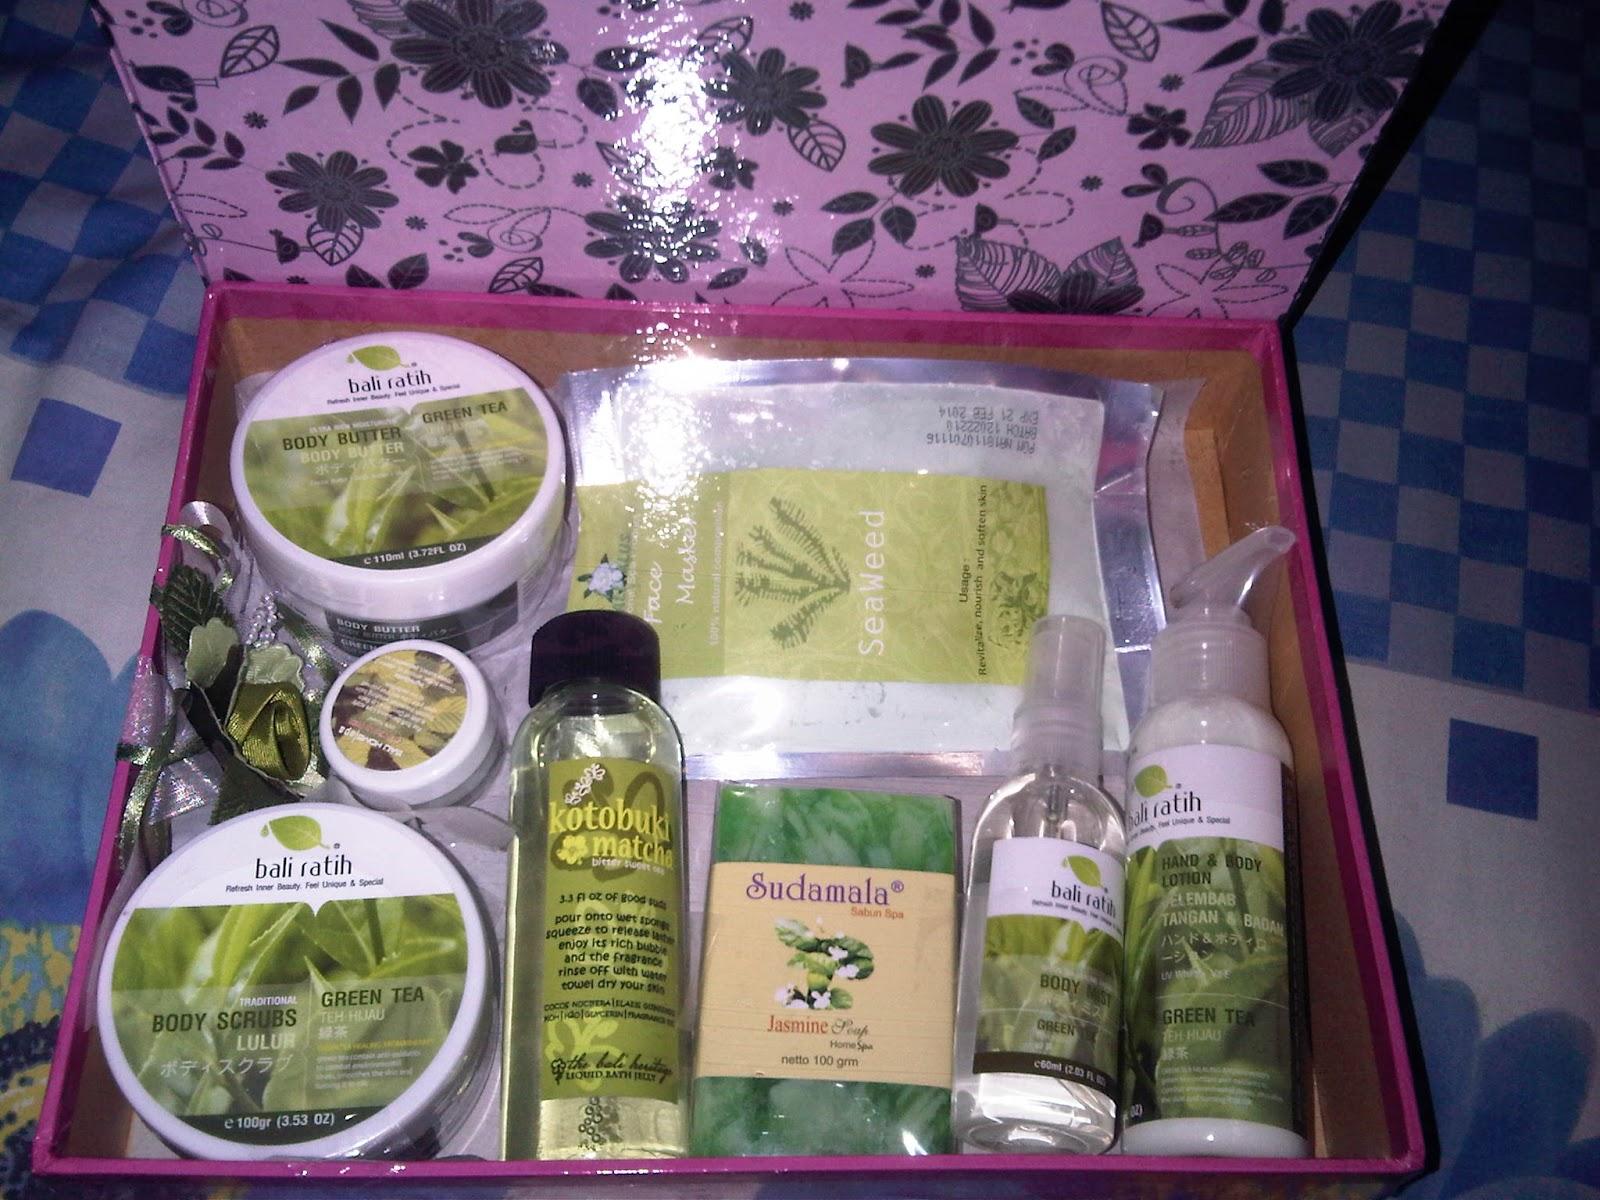 Aura Shop Paket Box Cantik Bali Ratih Body Lotion Dan Shower Gel Isi Butter Scrub Mist Sabun Natural Face Mask Lip Balm Plus Hiasan Bunga